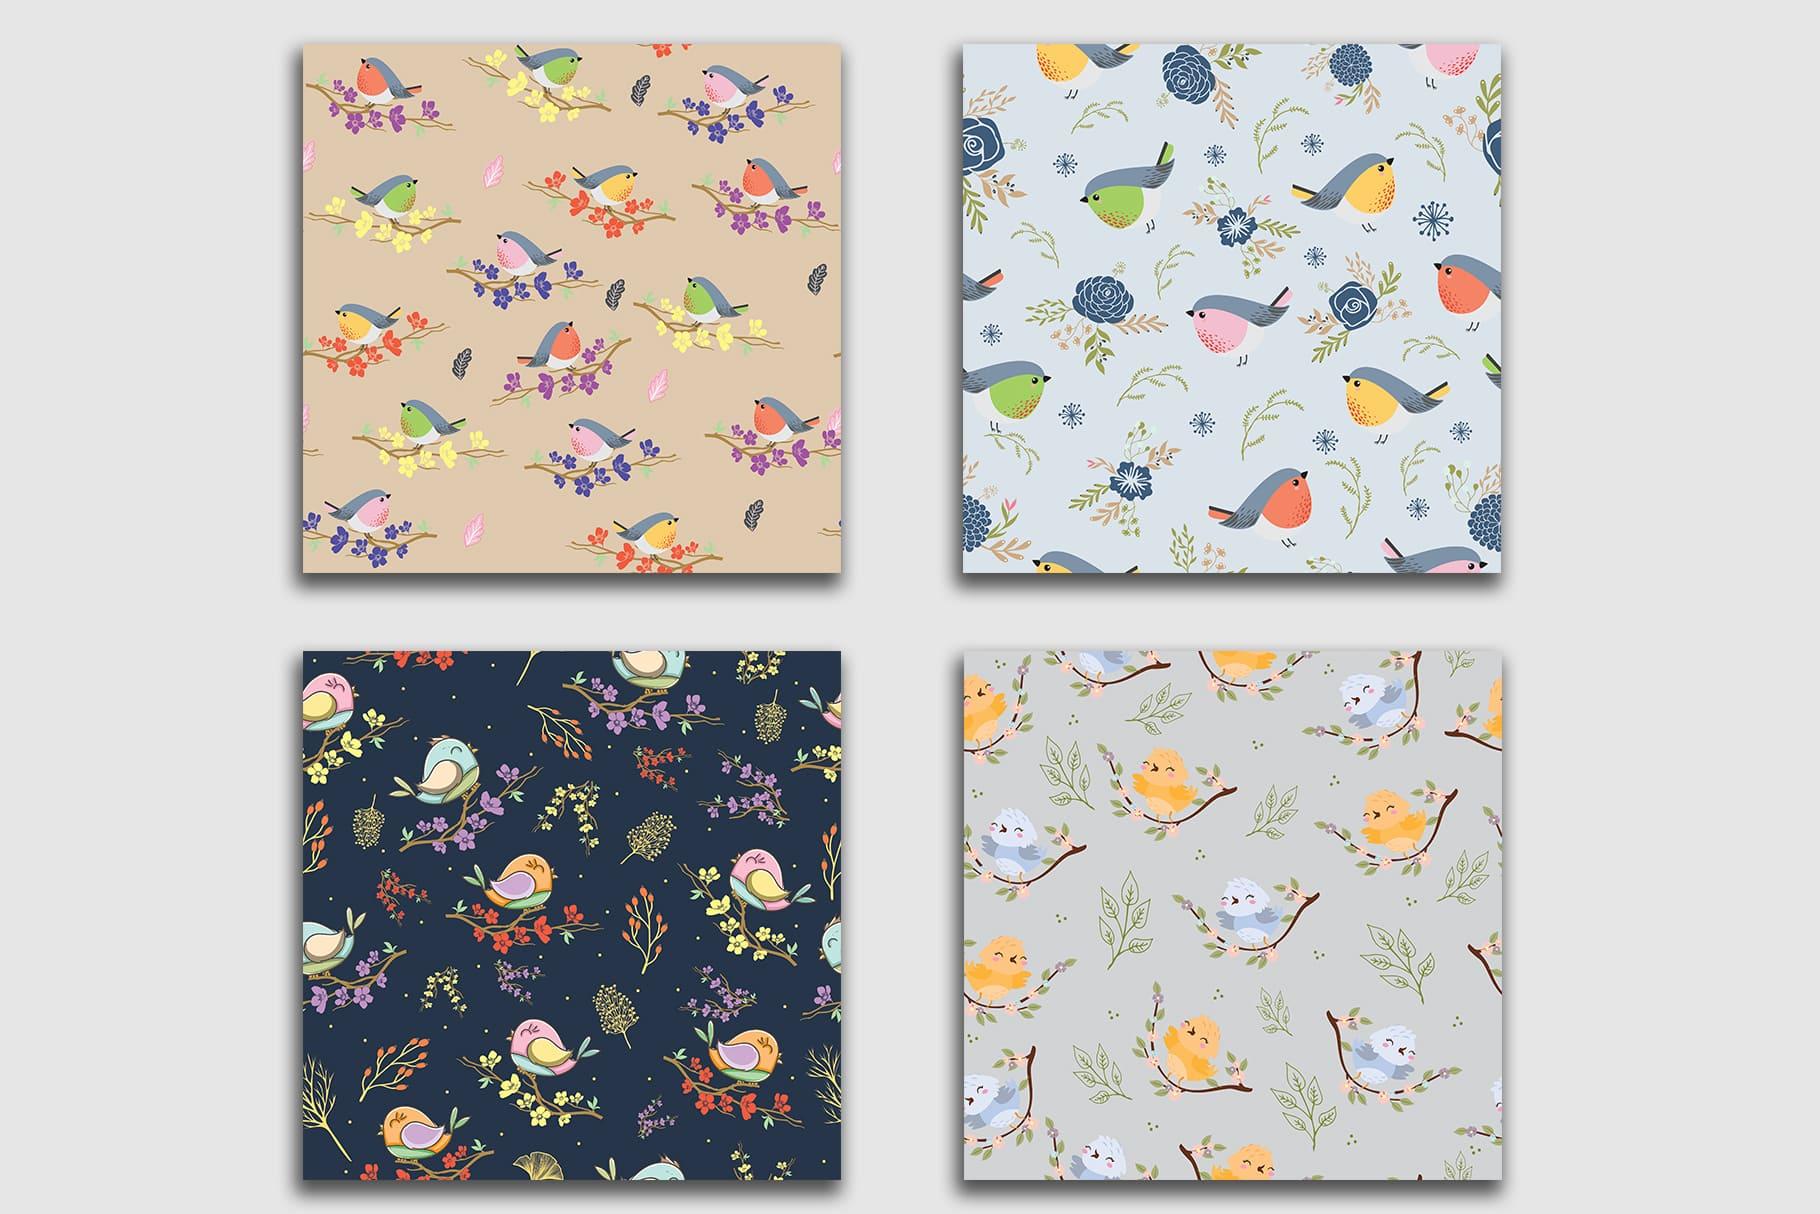 Square tiles in pastel colors depicting little birds.